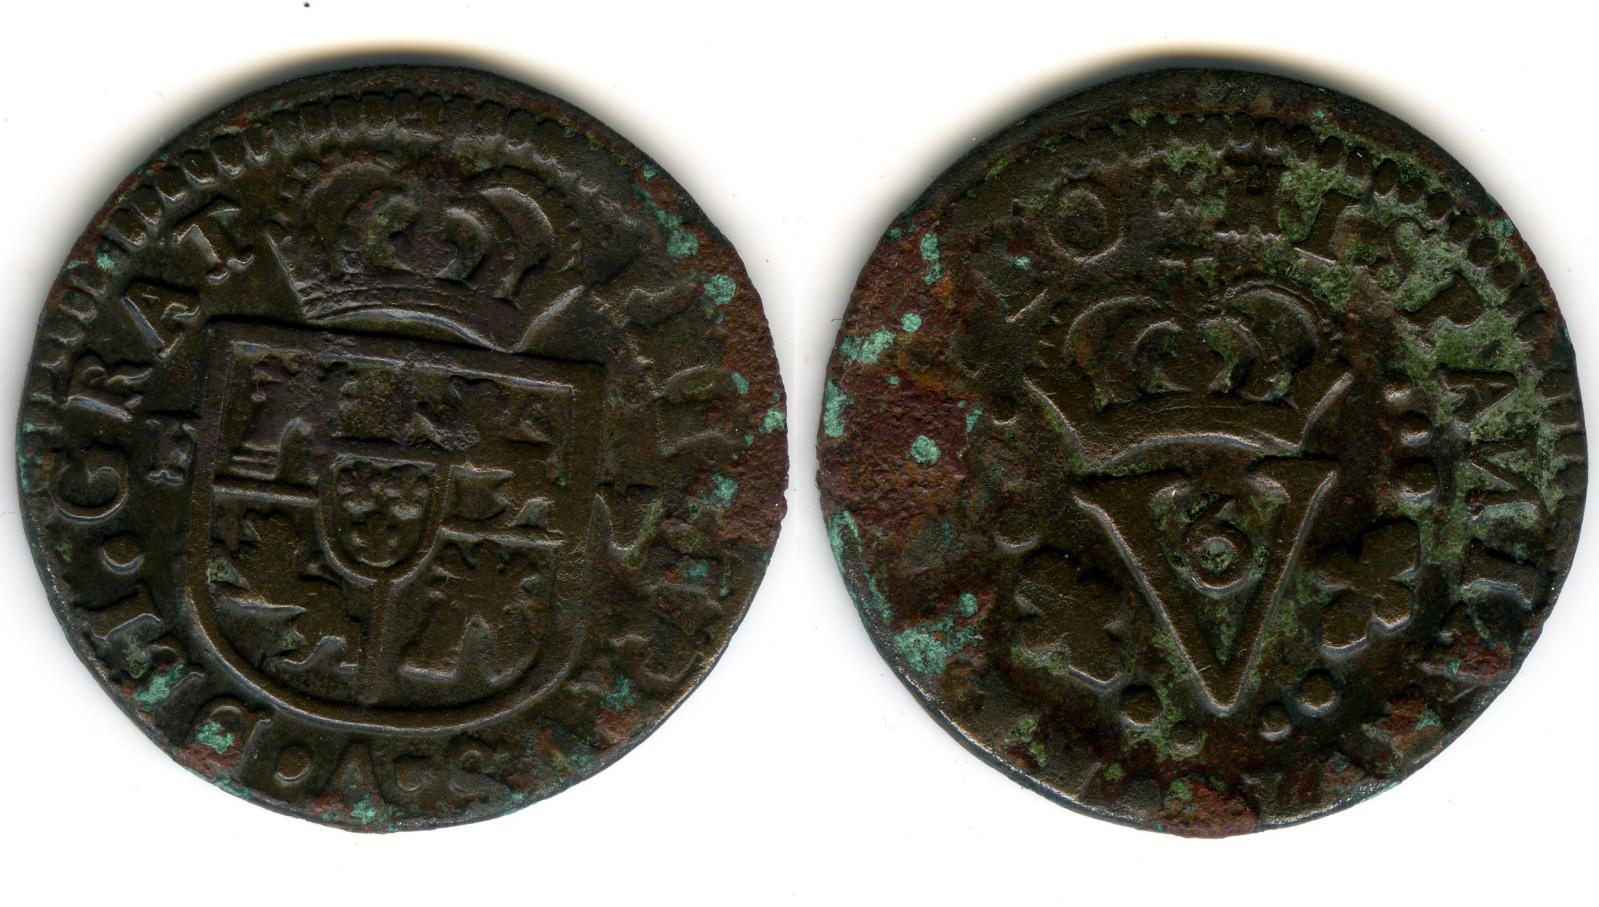 Seiseno de 1711, Felipe V. Valencia 2rgkleo